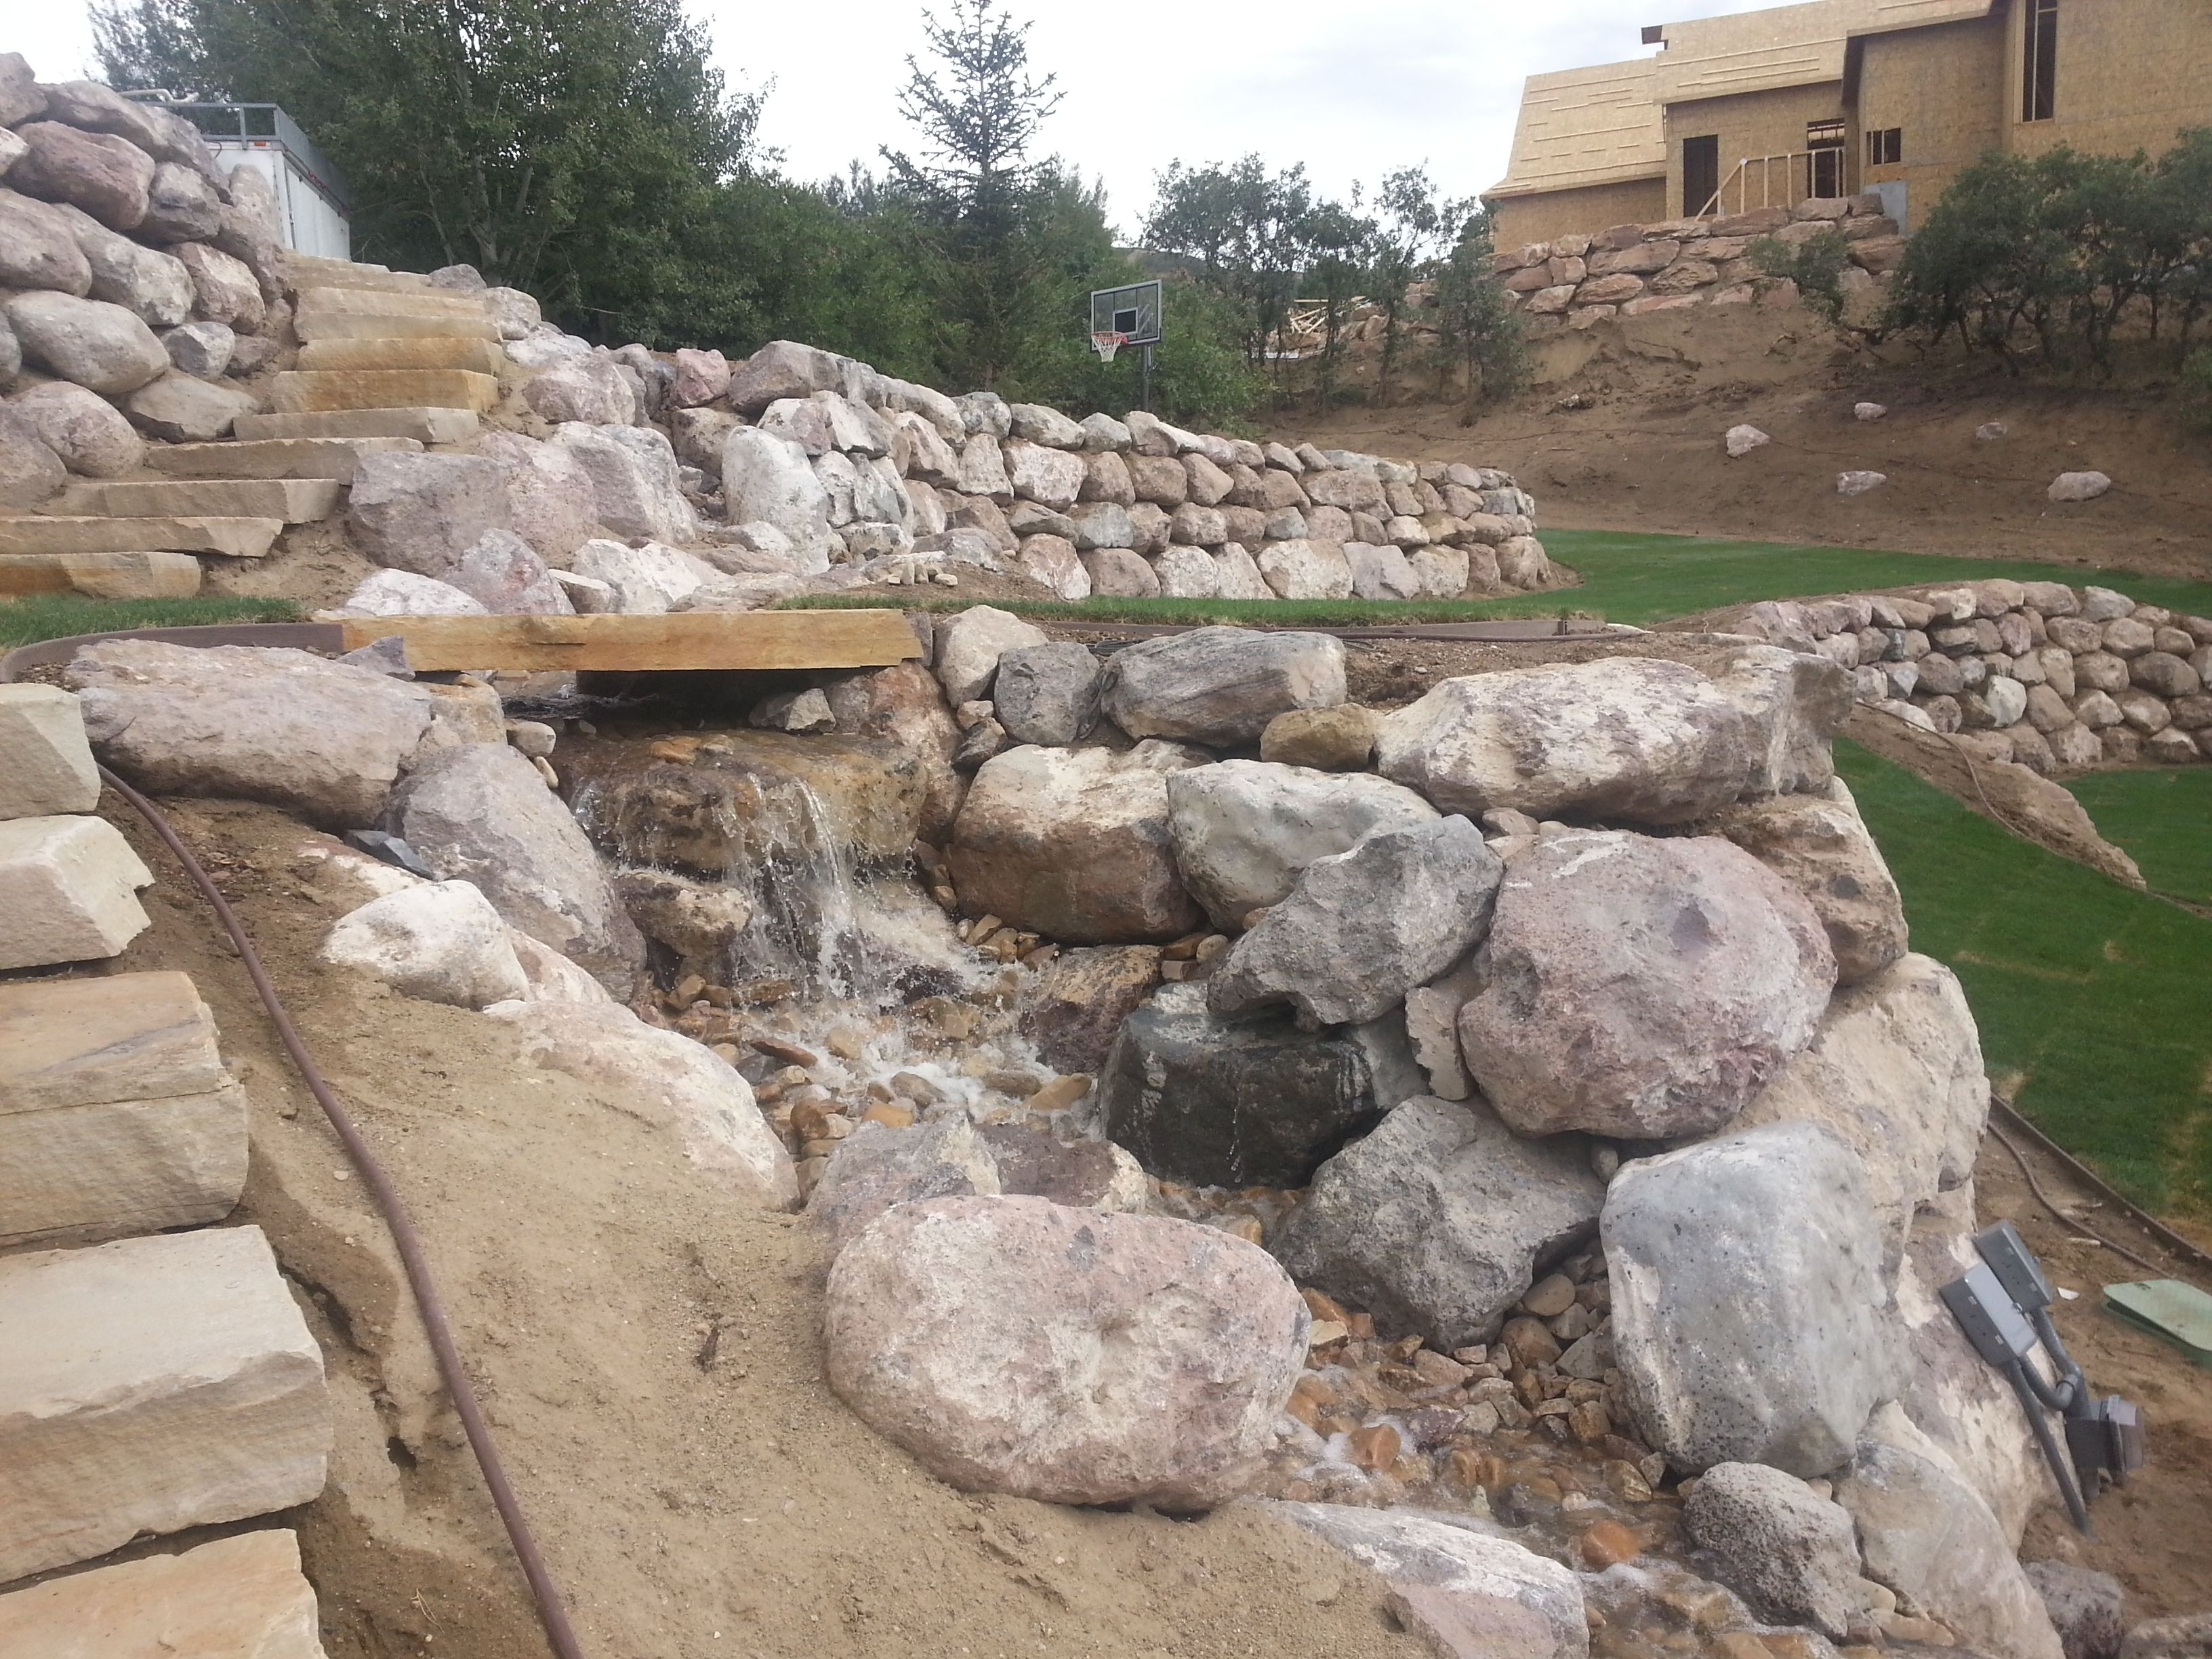 Rocks and Boulders - Google 搜索 | Fire pit backyard, Fire ...